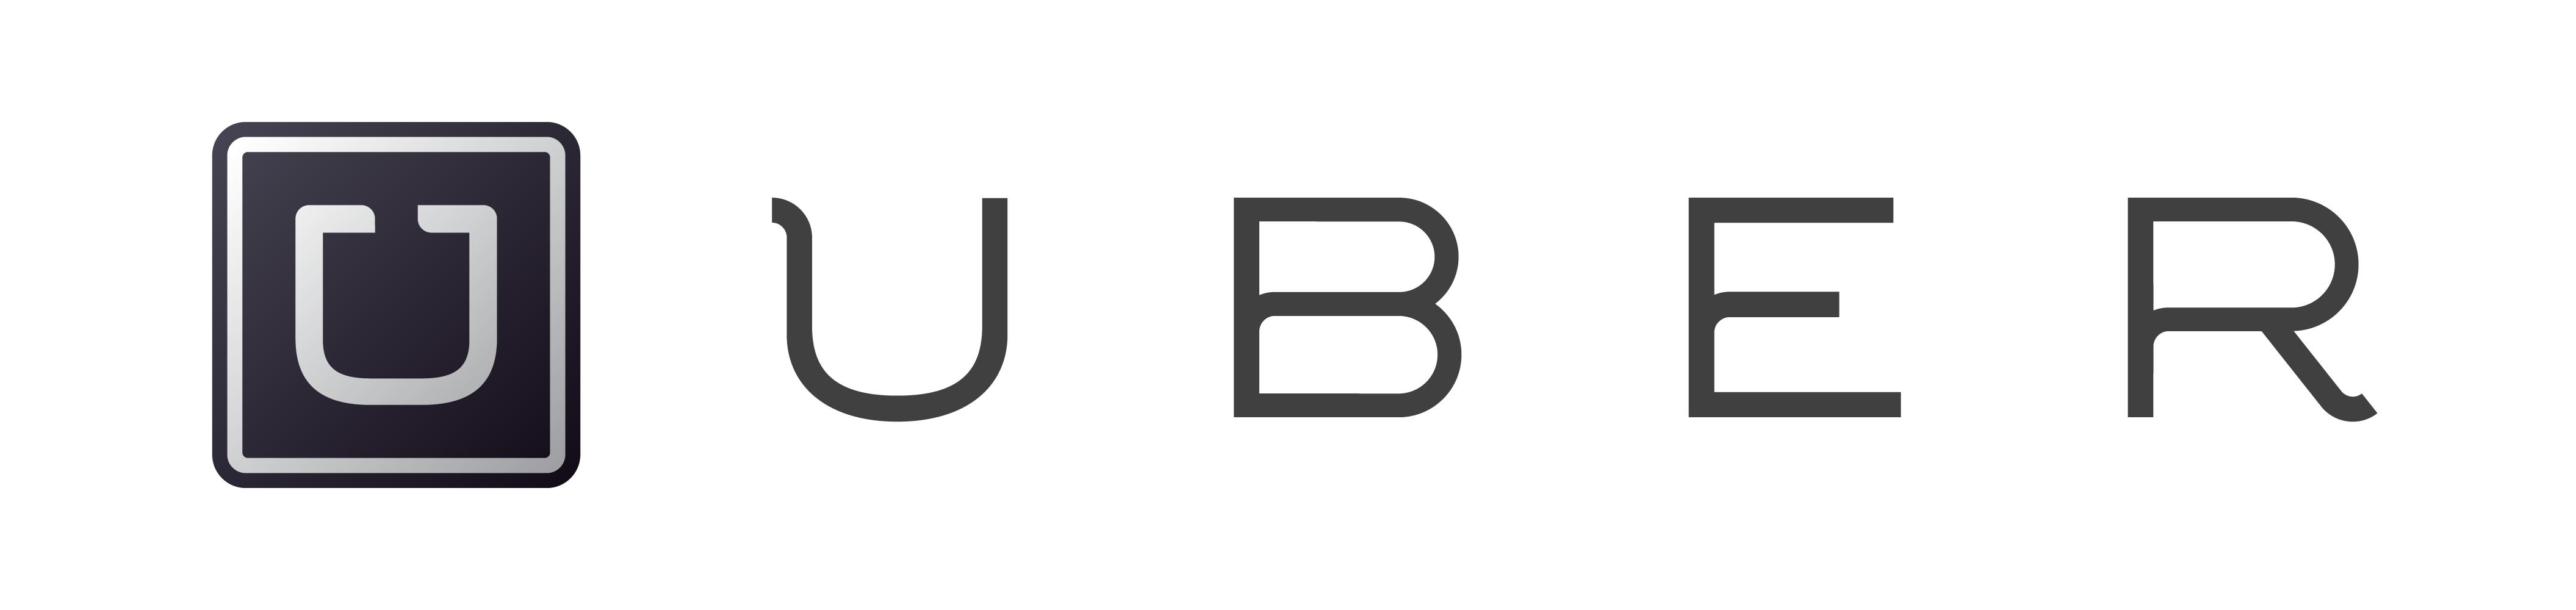 www.culturageek.com.ar Uber Elevate Vehículo Volador 3